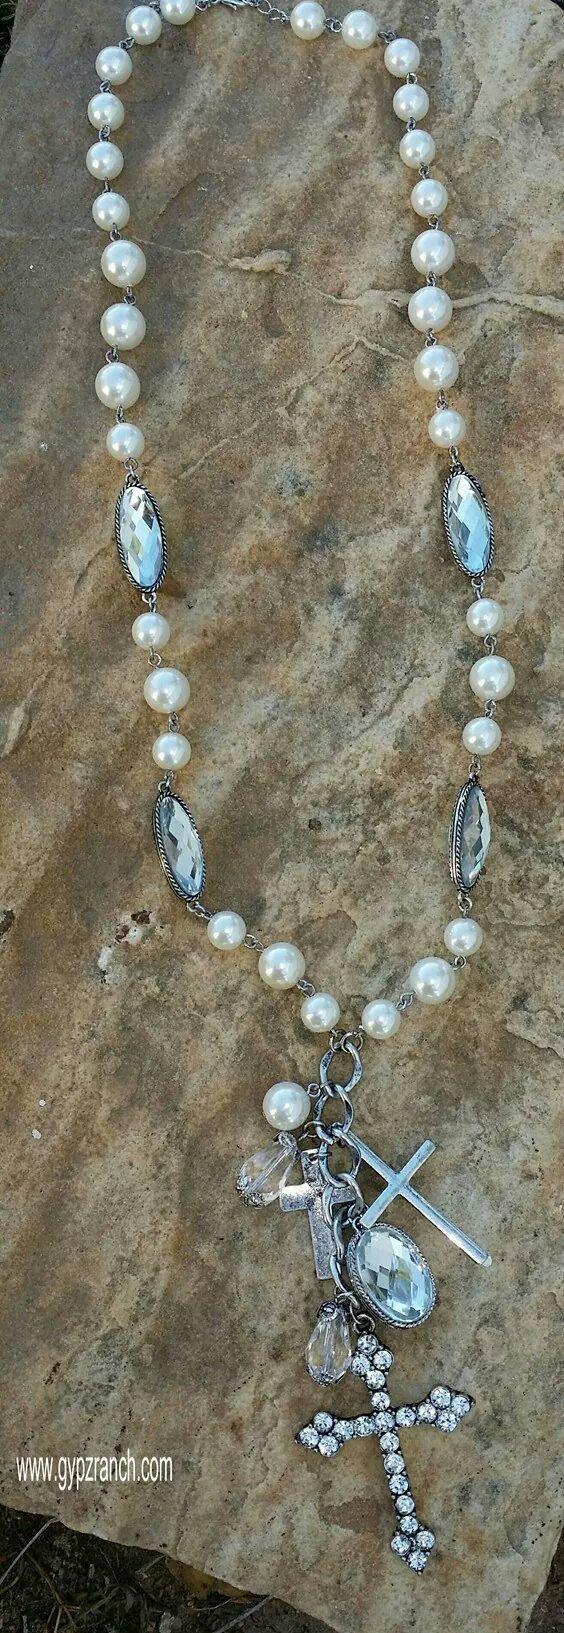 Cameron Cross Long Necklace - Pearl www.gypzranch.com